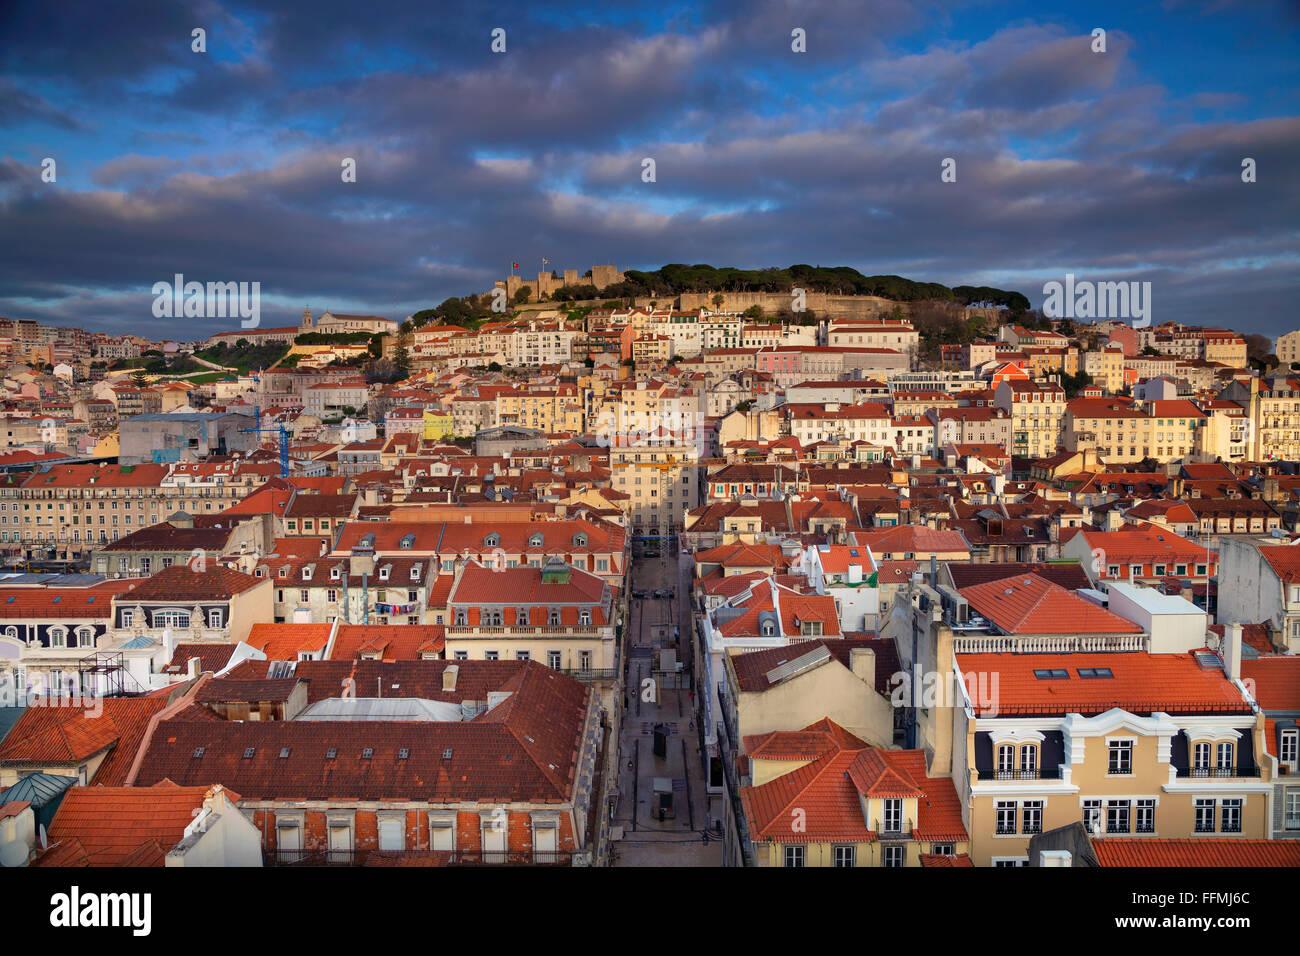 Lisboa. Imagen de Lisboa, Portugal, durante la hora dorada. Imagen De Stock